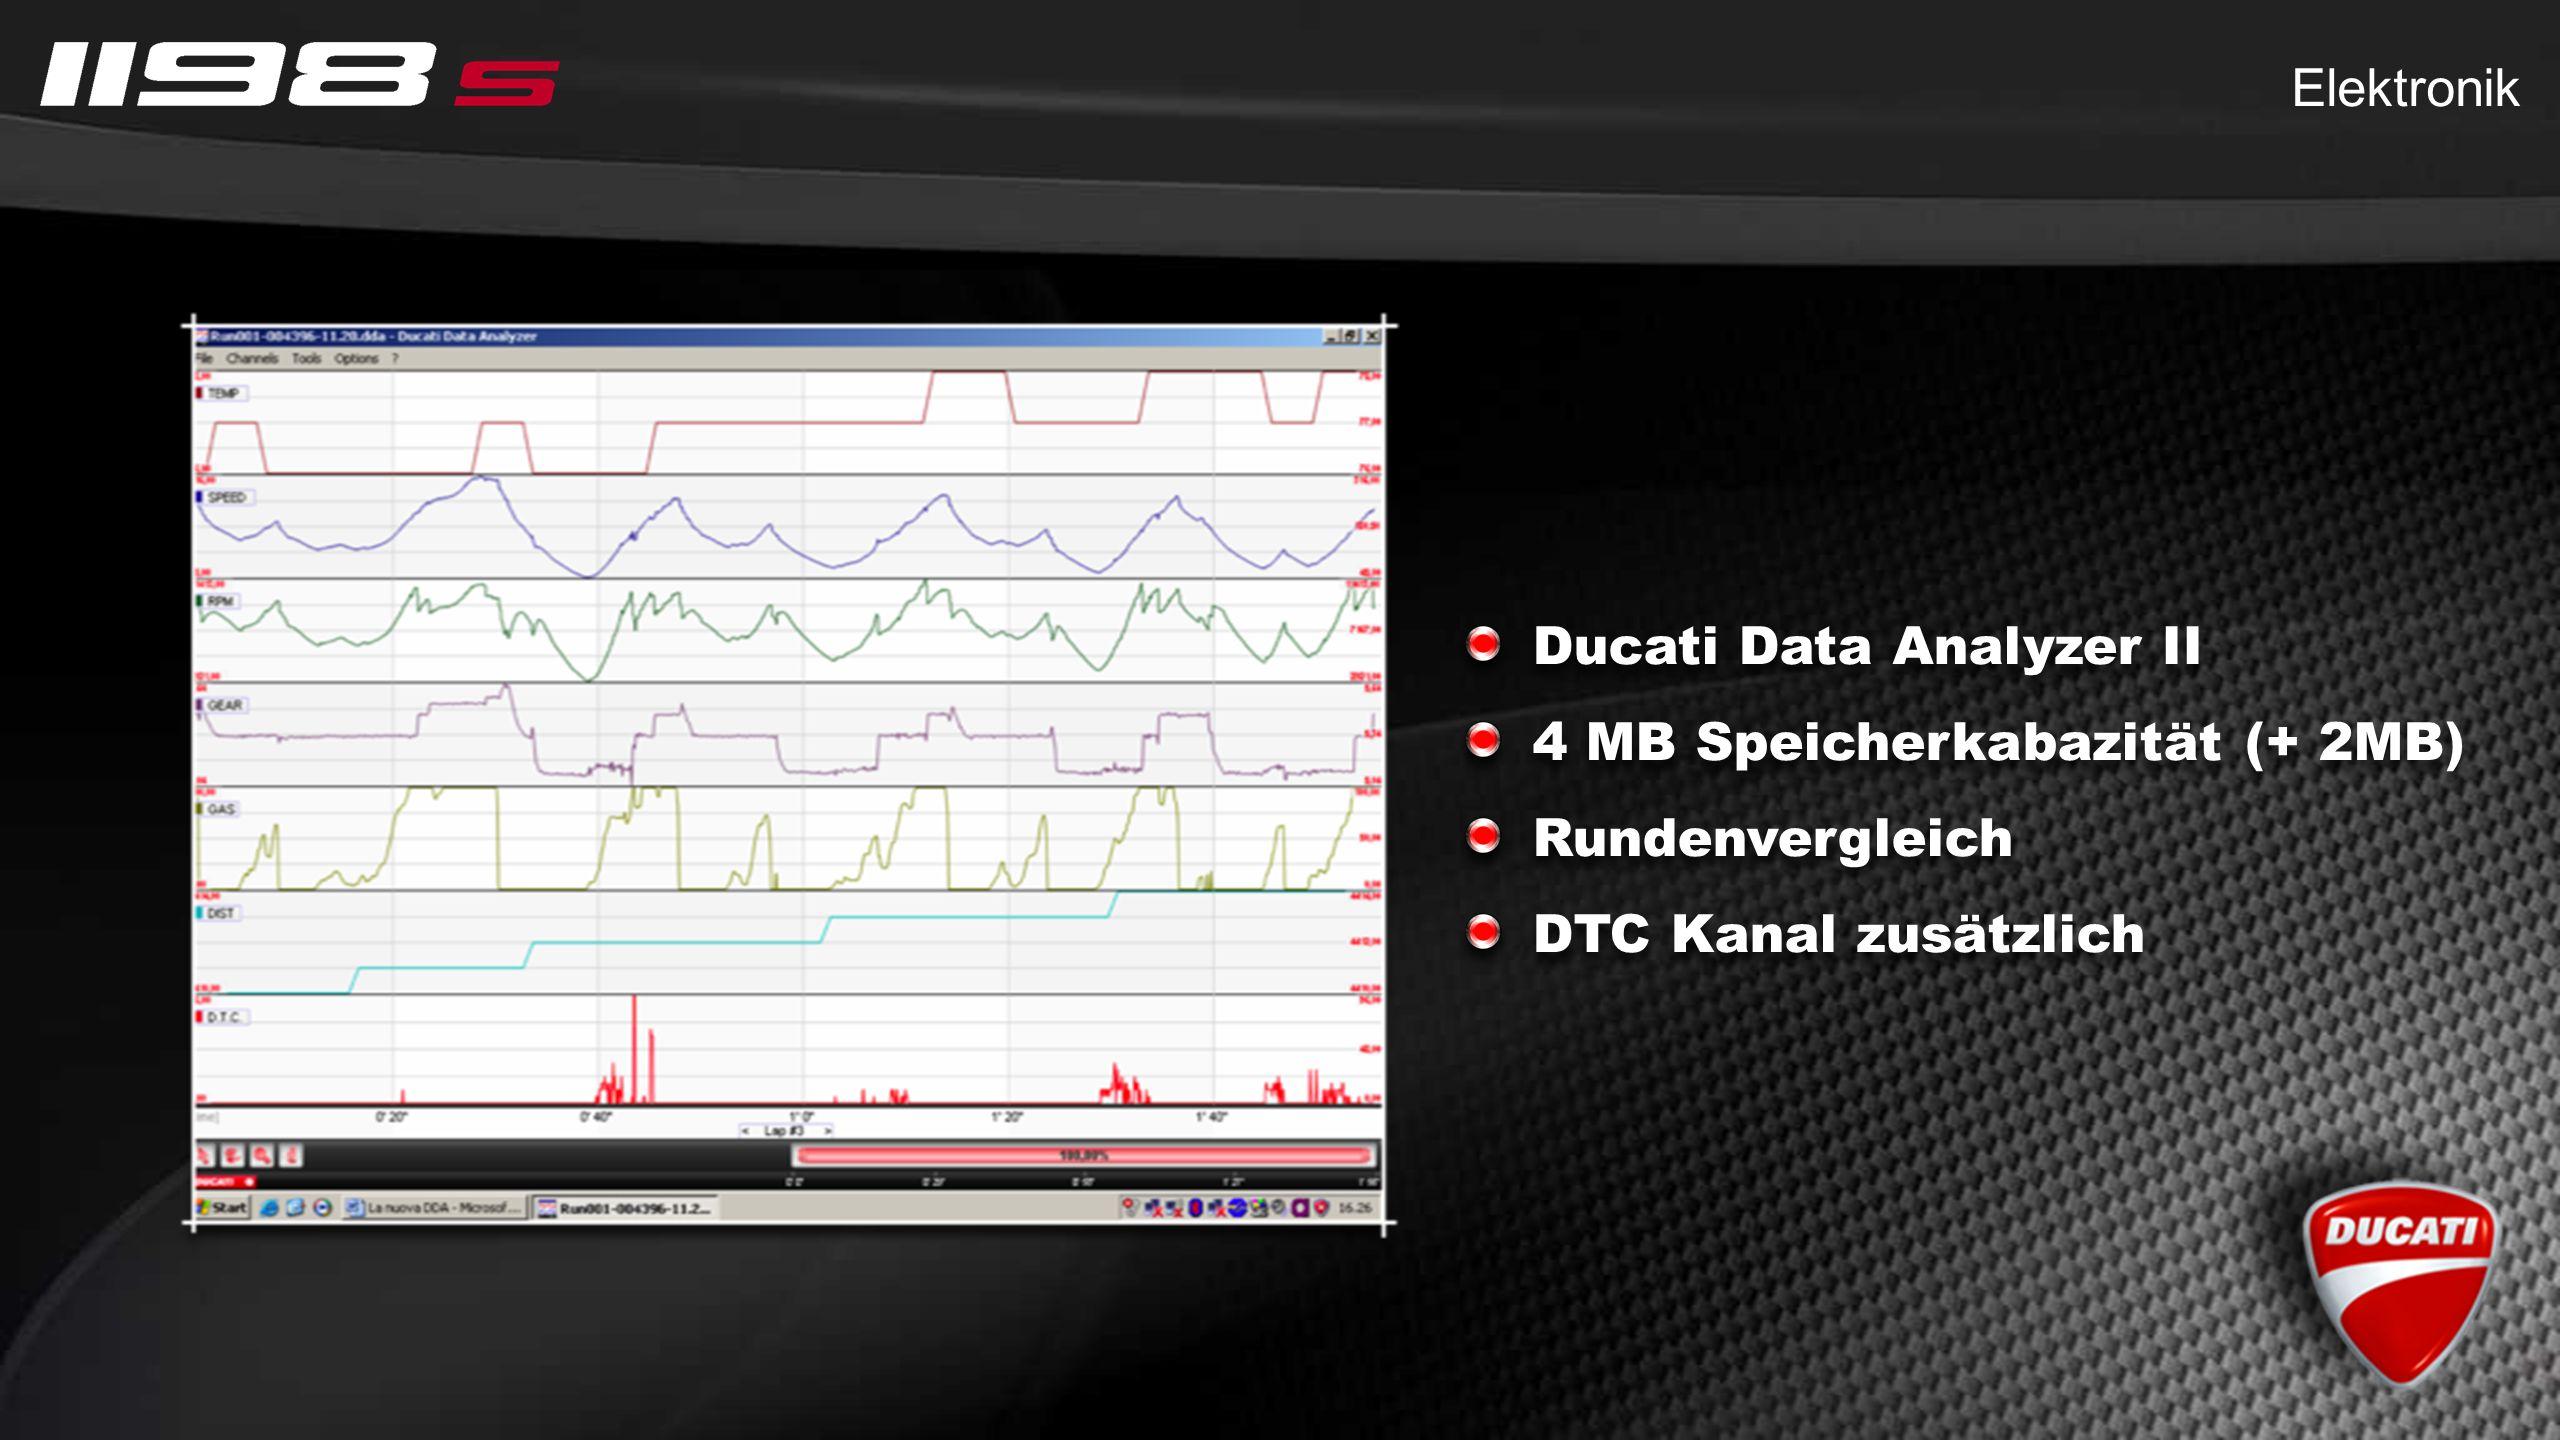 Ducati Data Analyzer II 4 MB Speicherkabazität (+ 2MB) Rundenvergleich DTC Kanal zusätzlich Ducati Data Analyzer II 4 MB Speicherkabazität (+ 2MB) Run